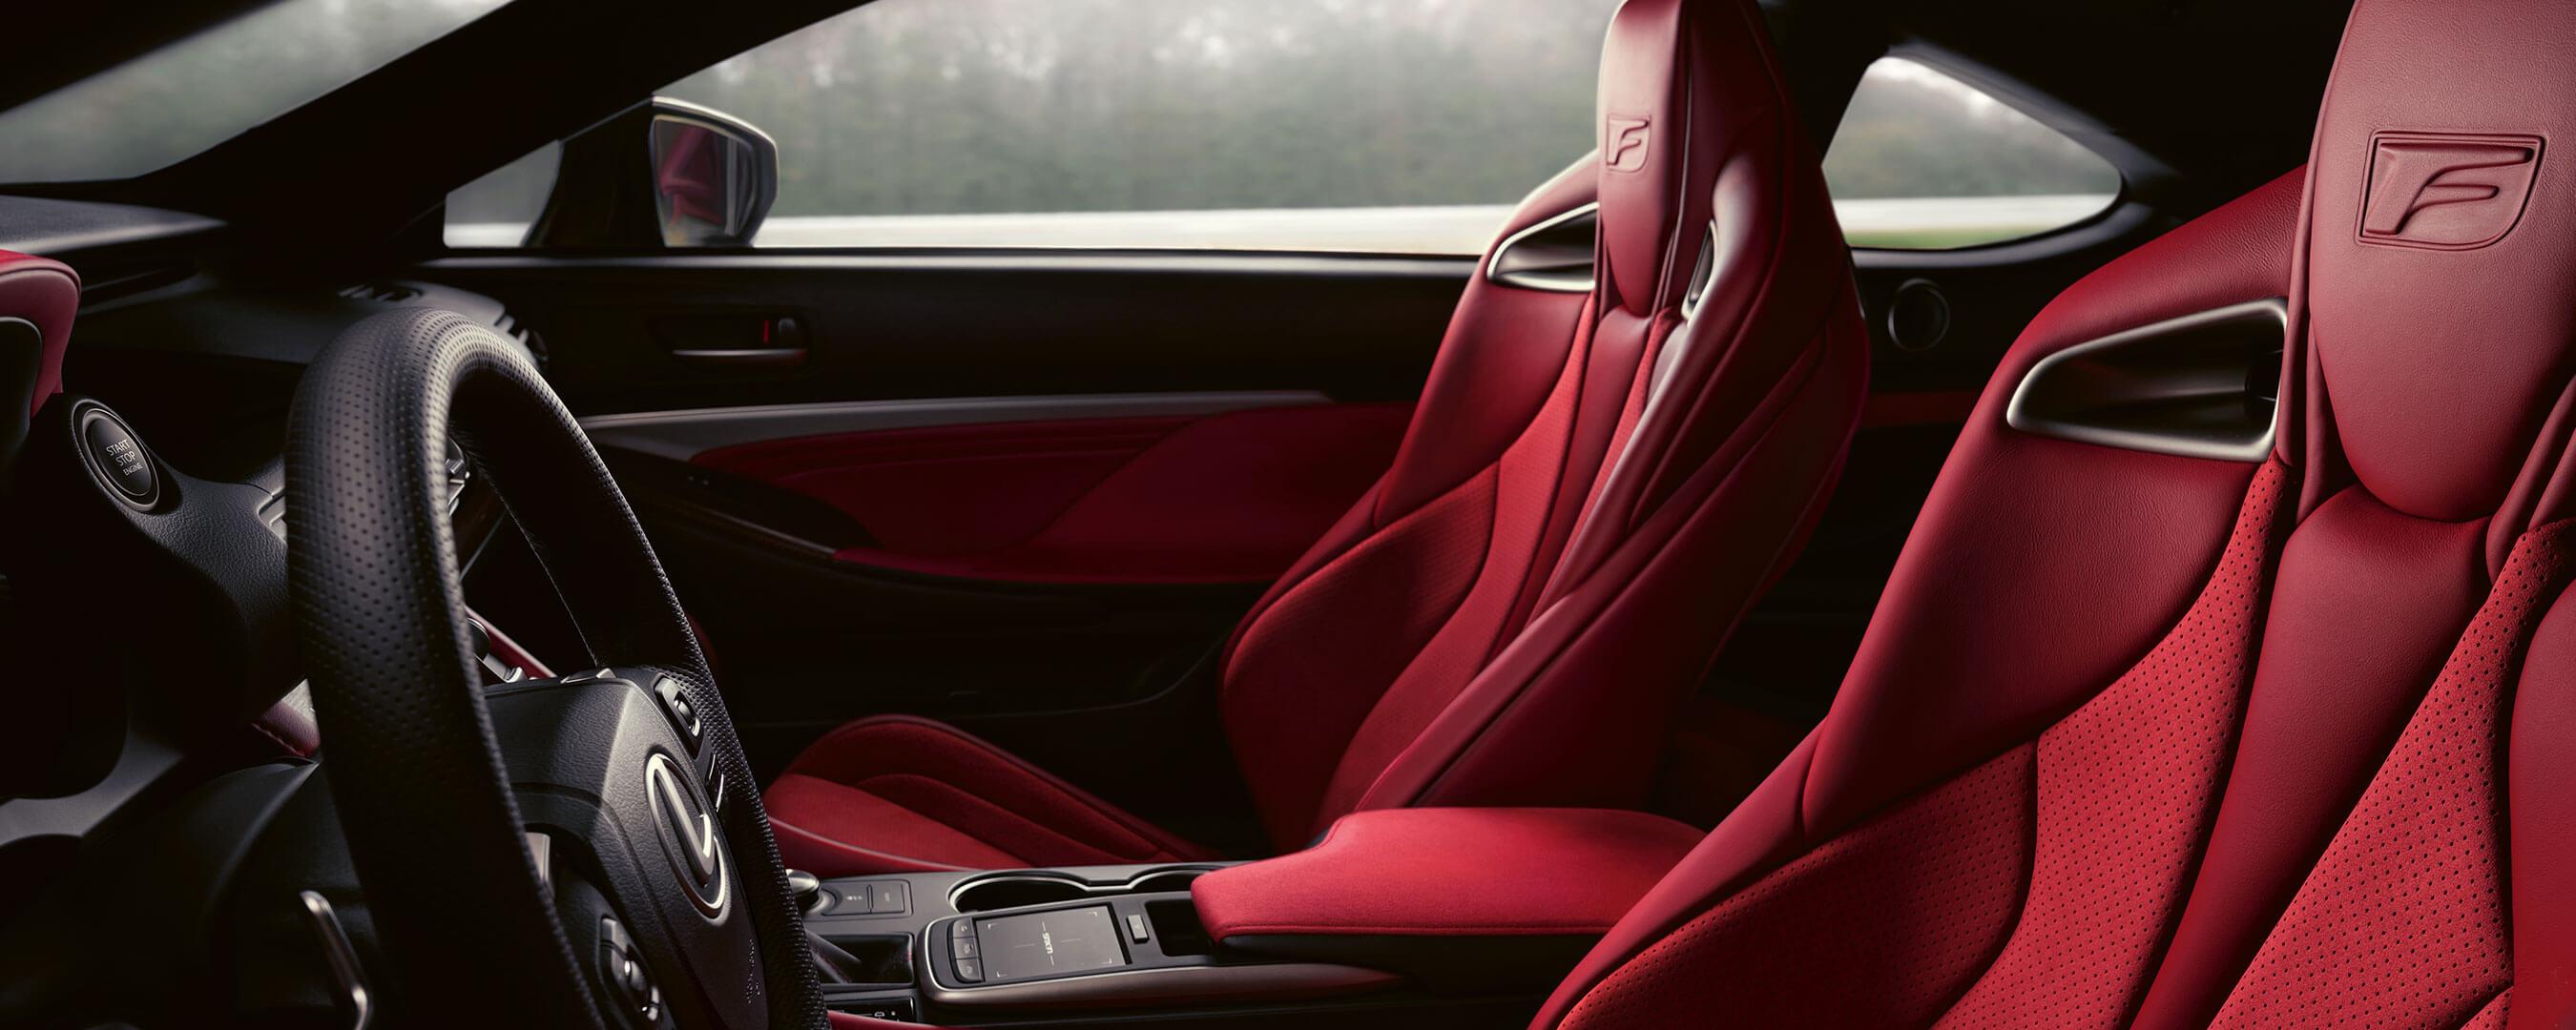 2019 lexus rc f experience hero interior rear